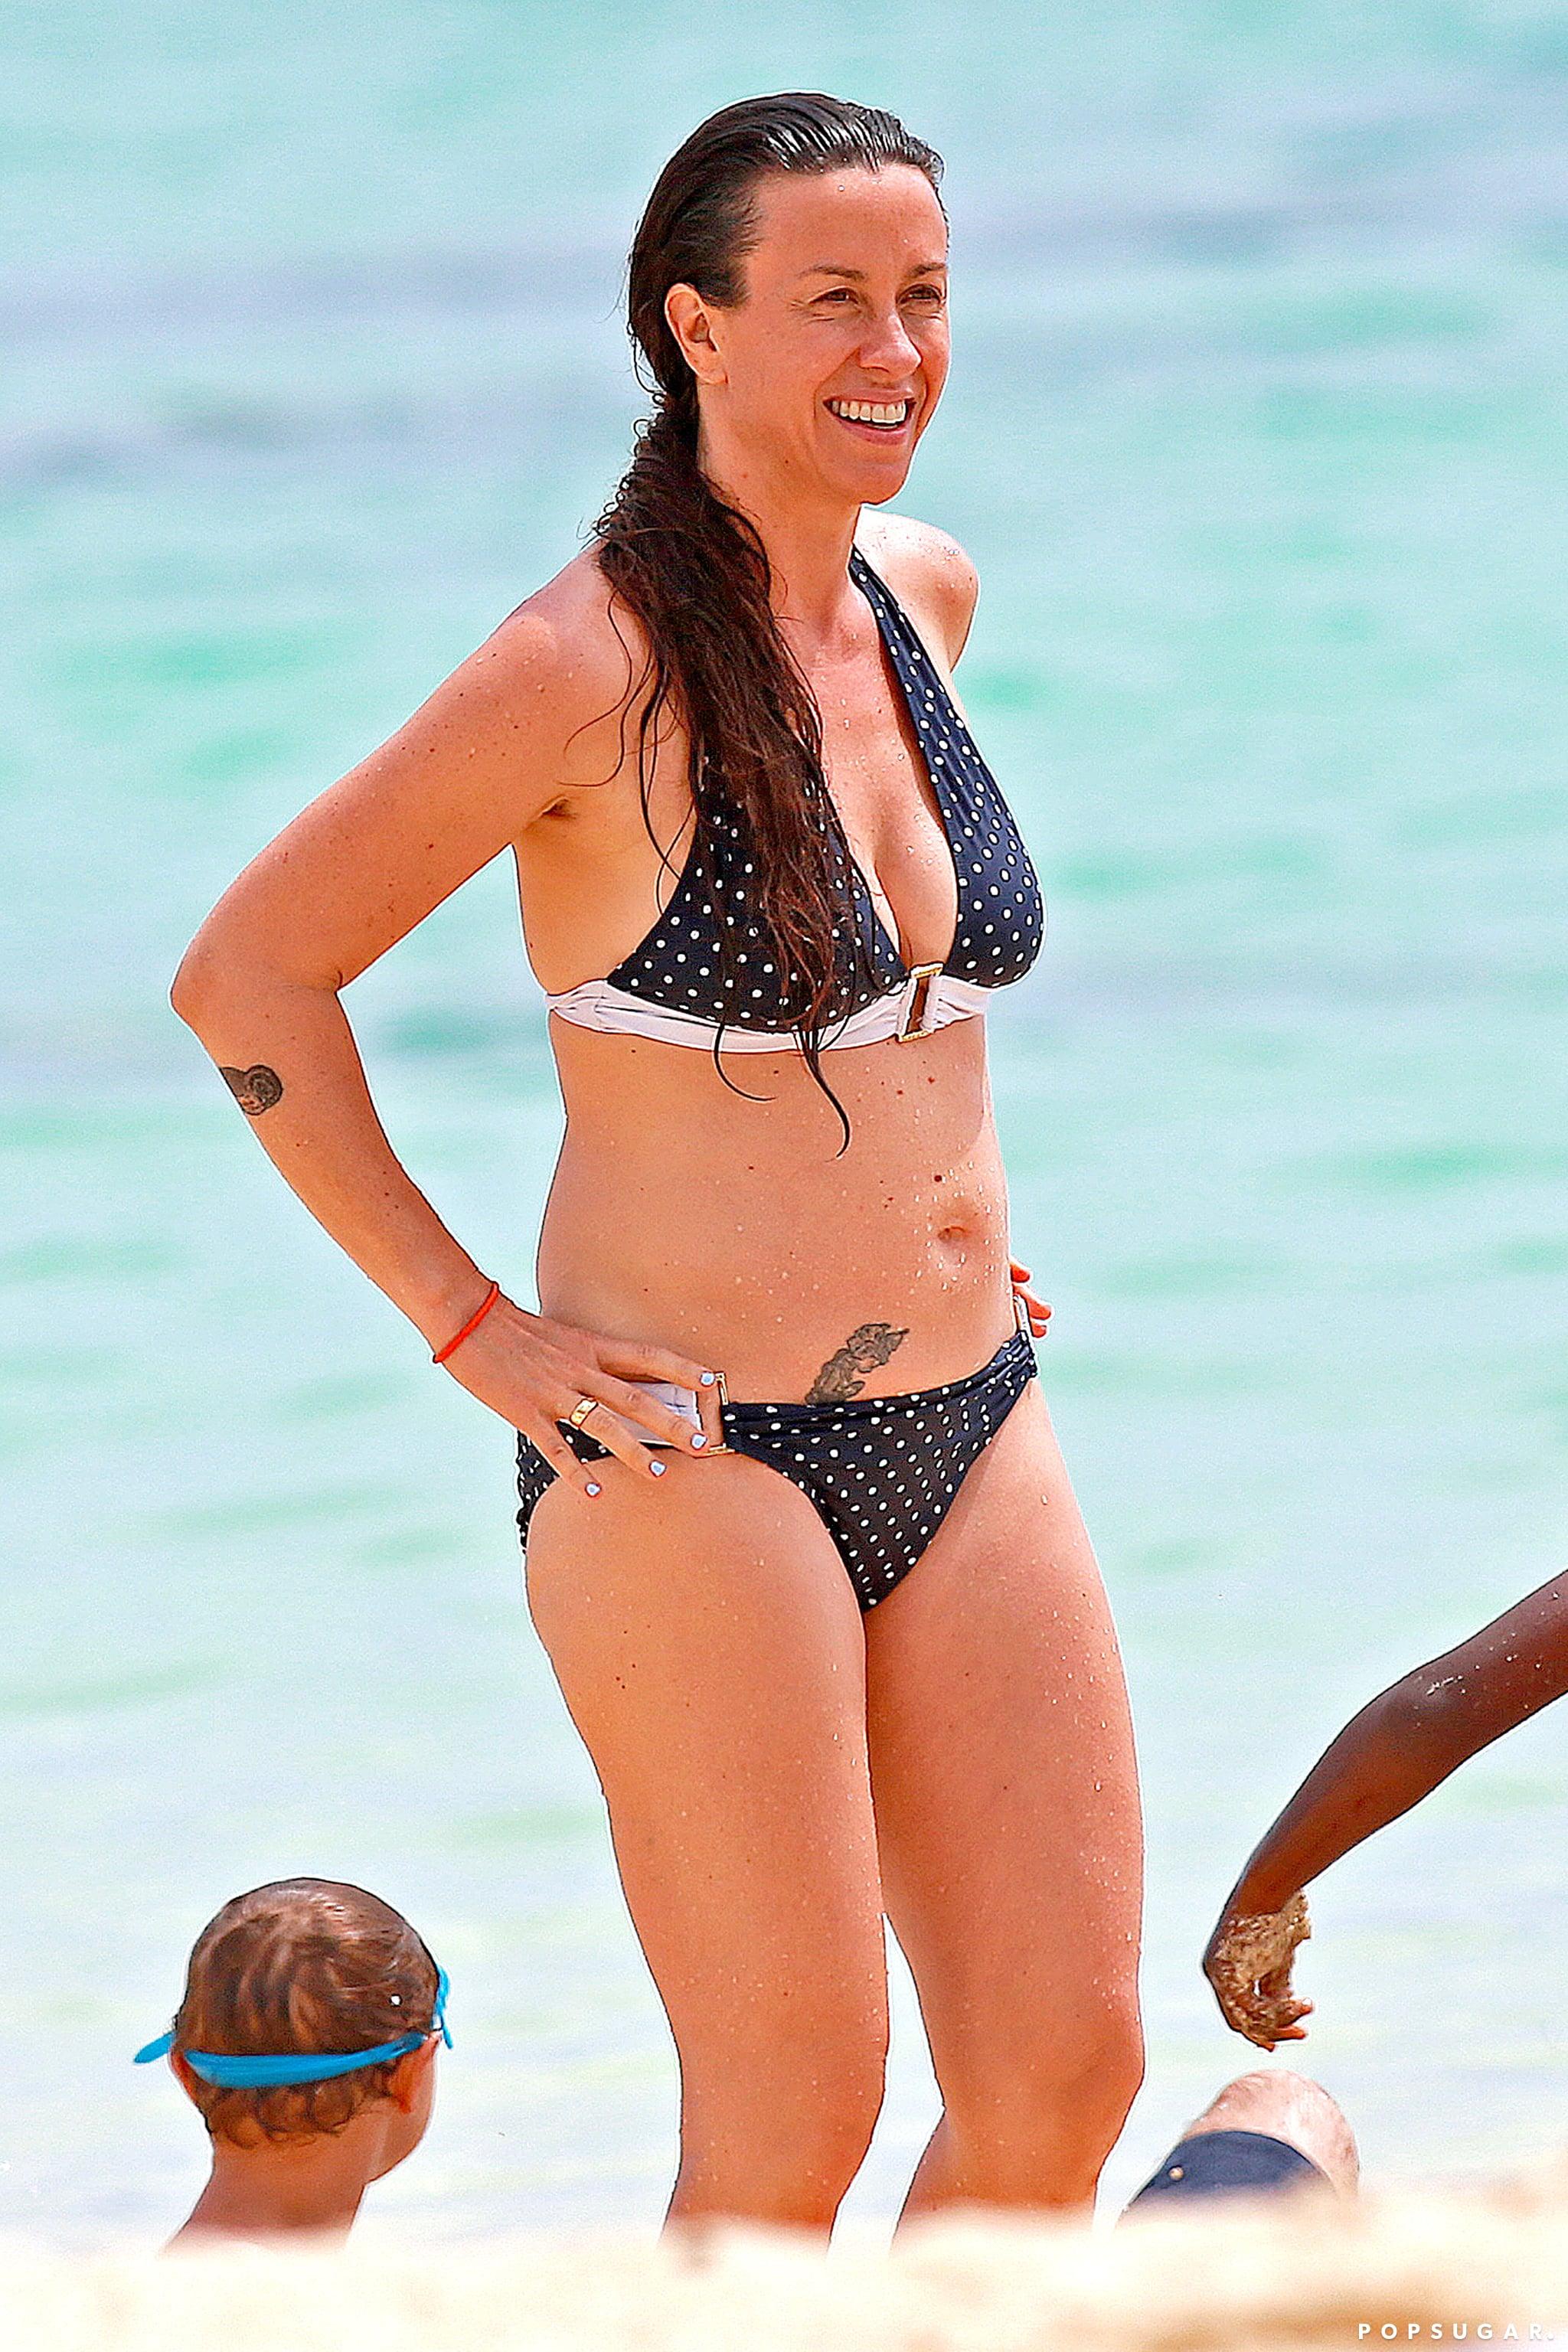 Alanis Morissette Bikini